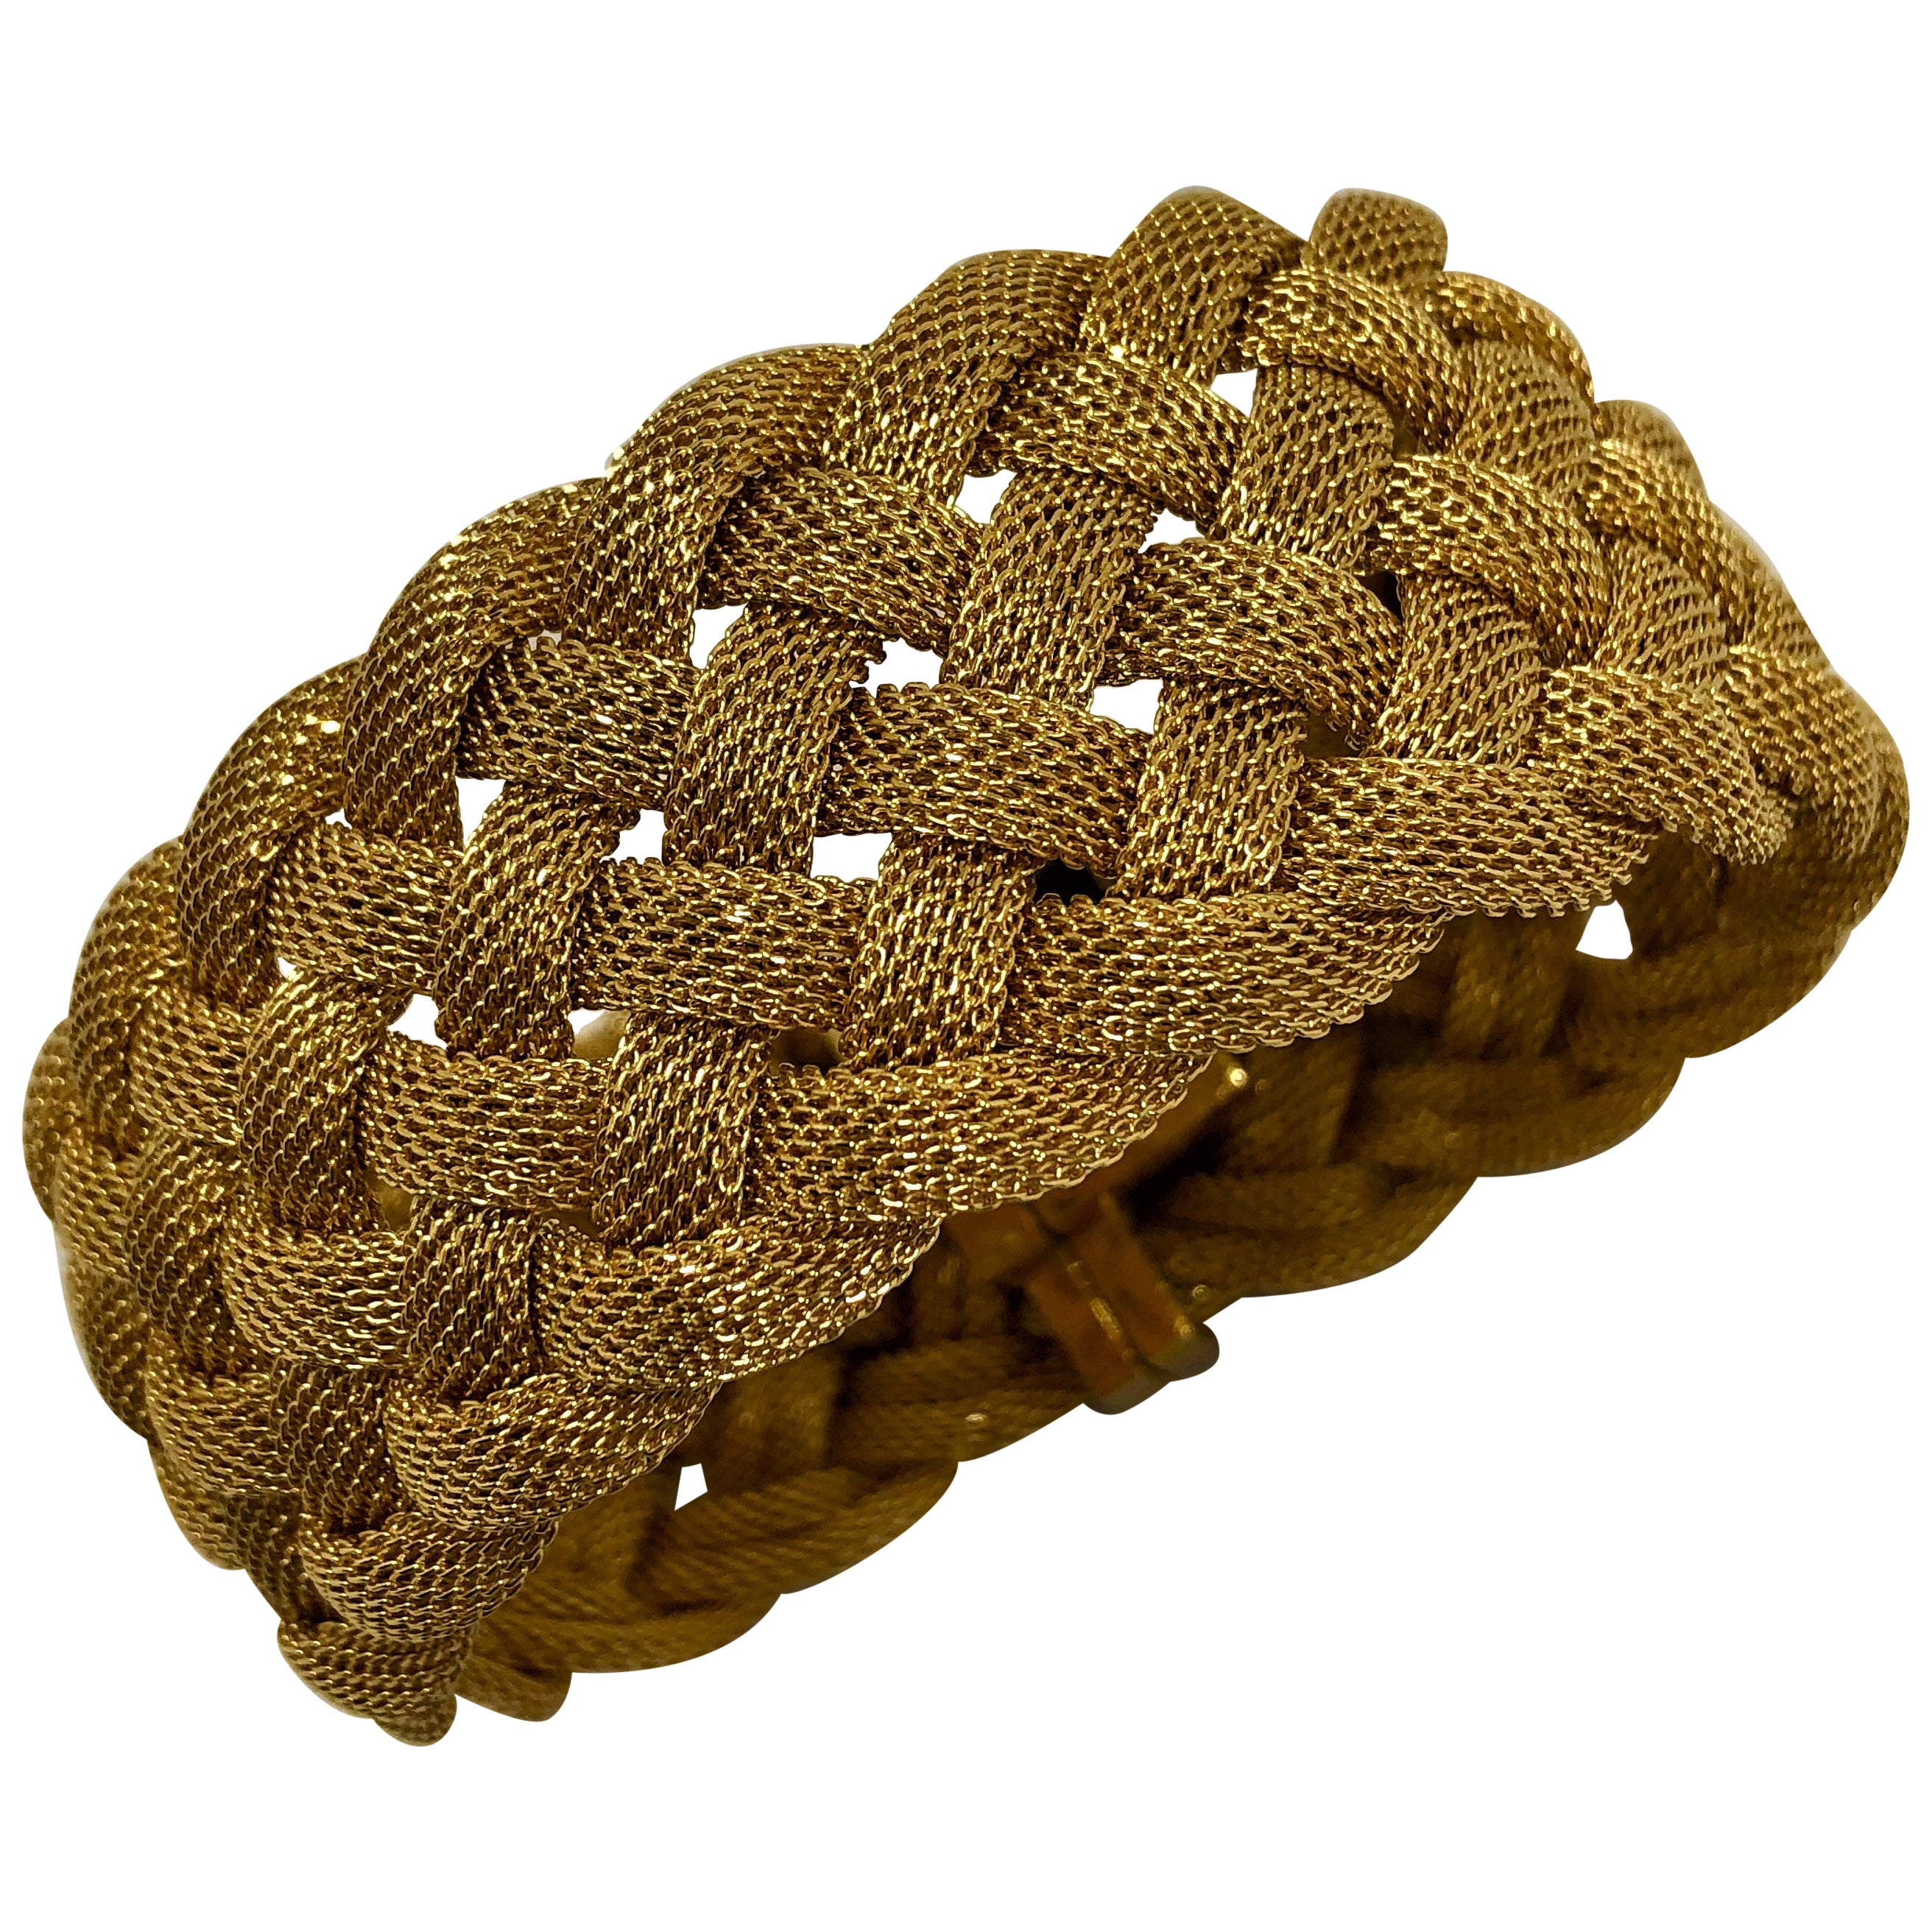 Tiffany & Co. Woven Gold Mesh Bracelet